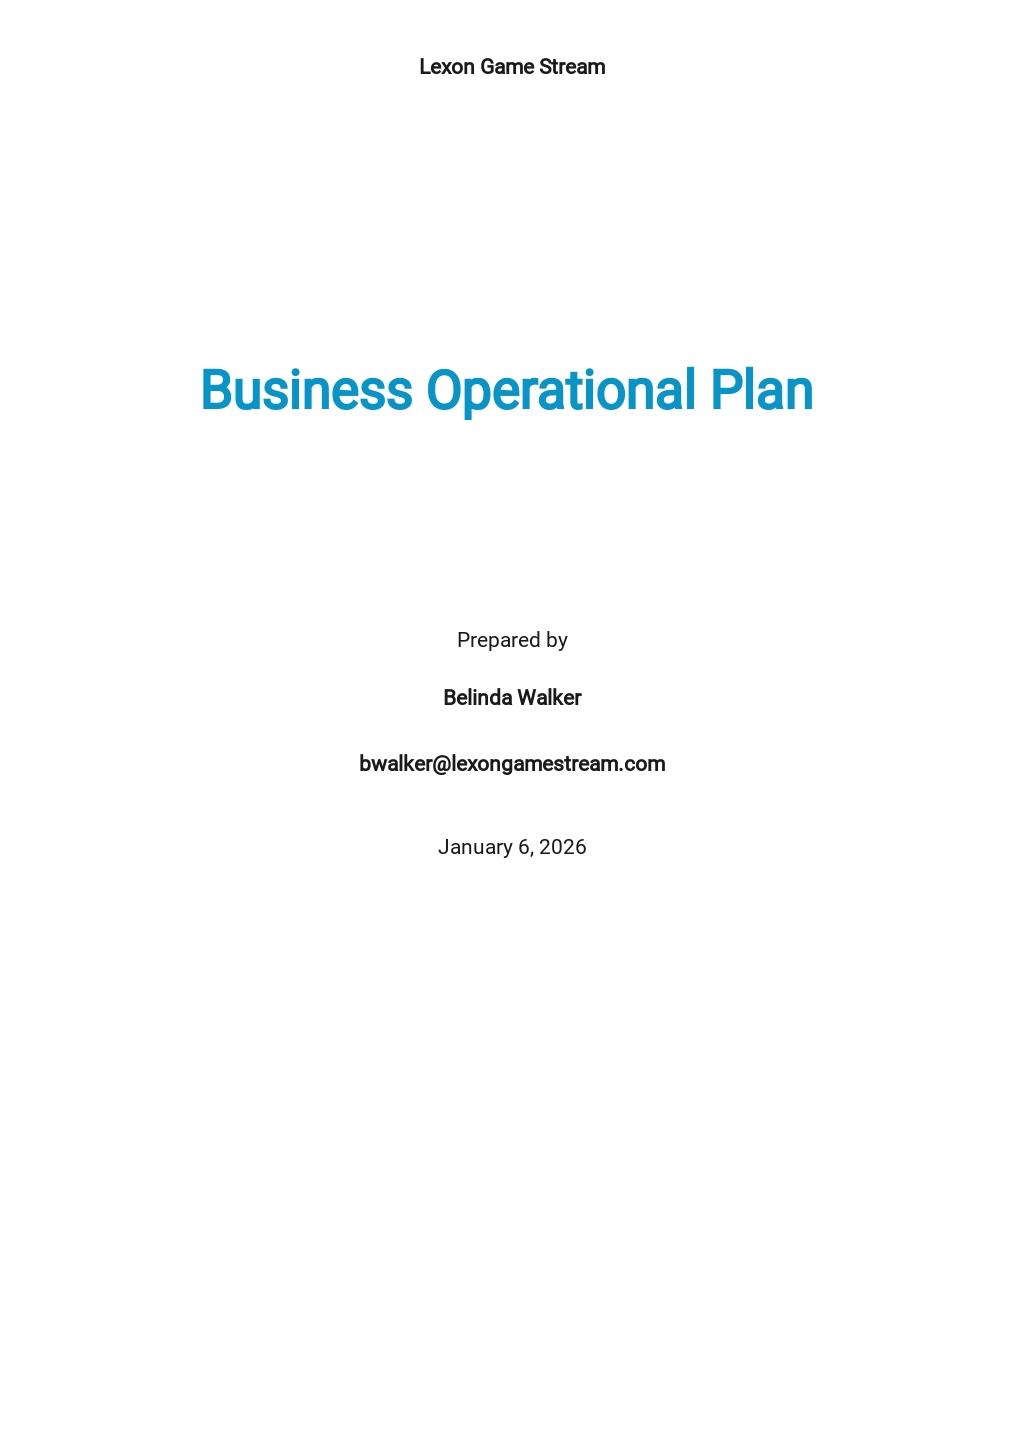 Business Operational Plan Template.jpe